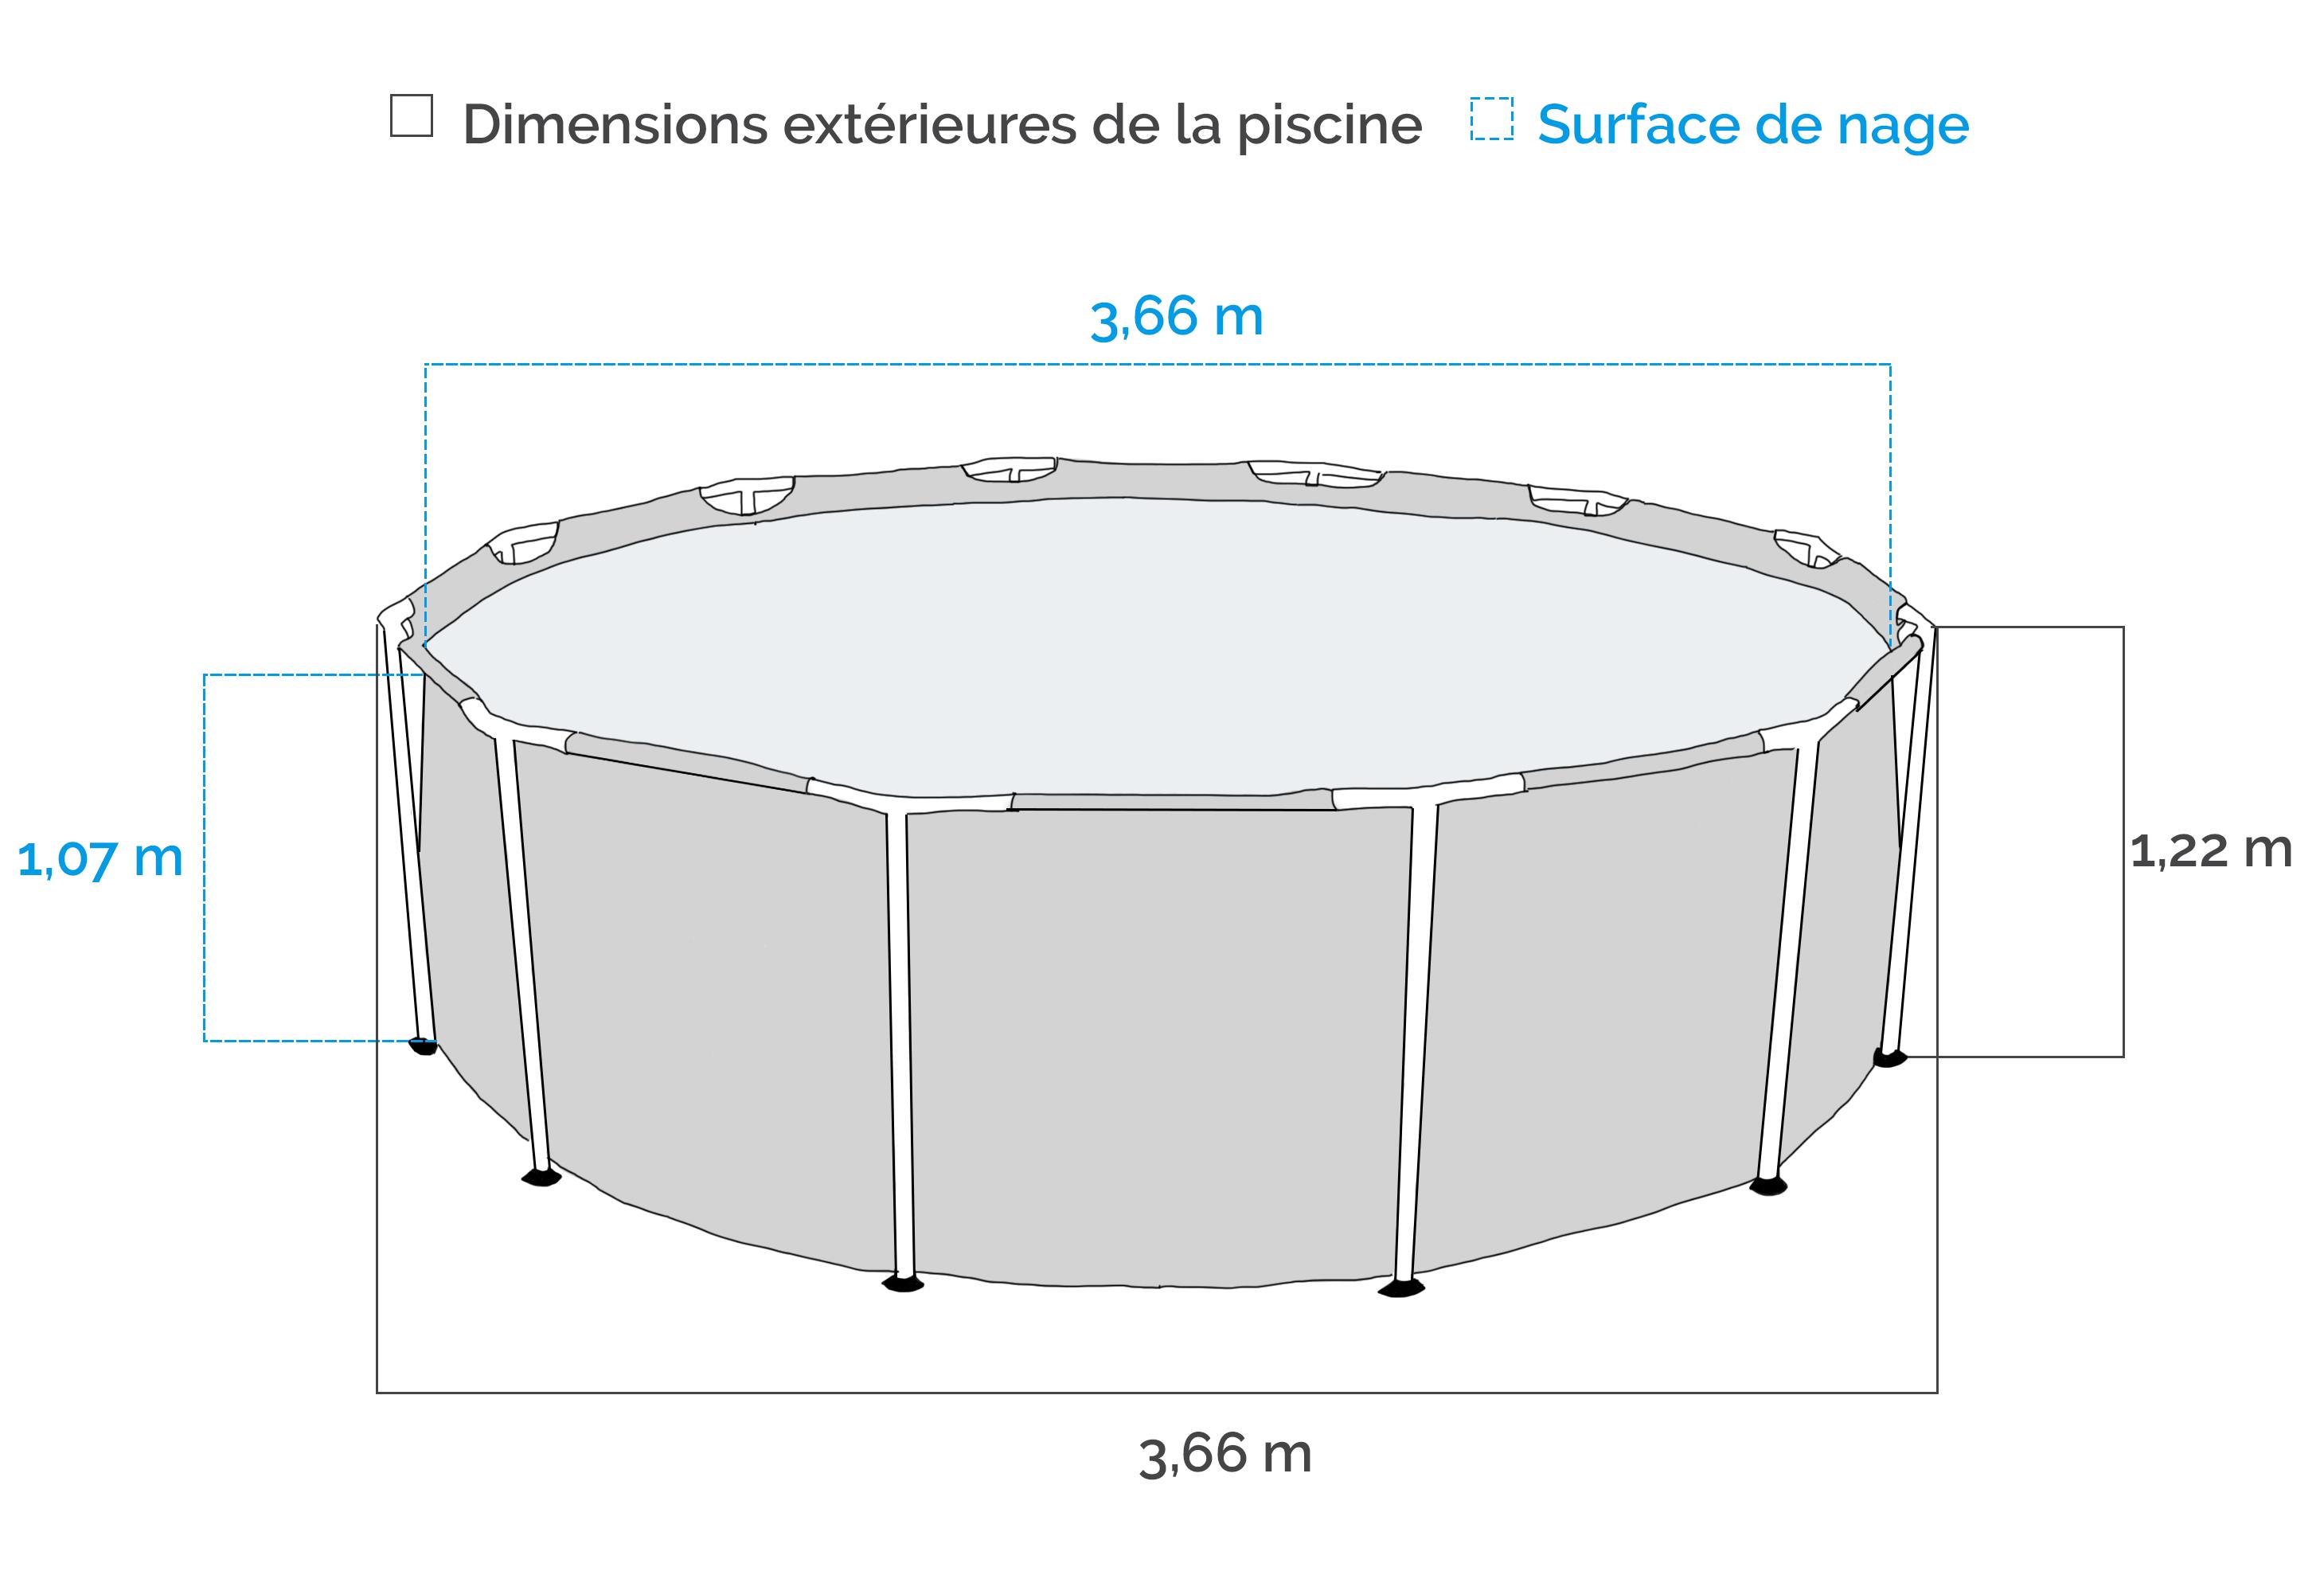 Piscine Tubulaire Intex Prism Frame 3,66 X 1,22 M dedans Piscine Tubulaire Intex Pas Cher